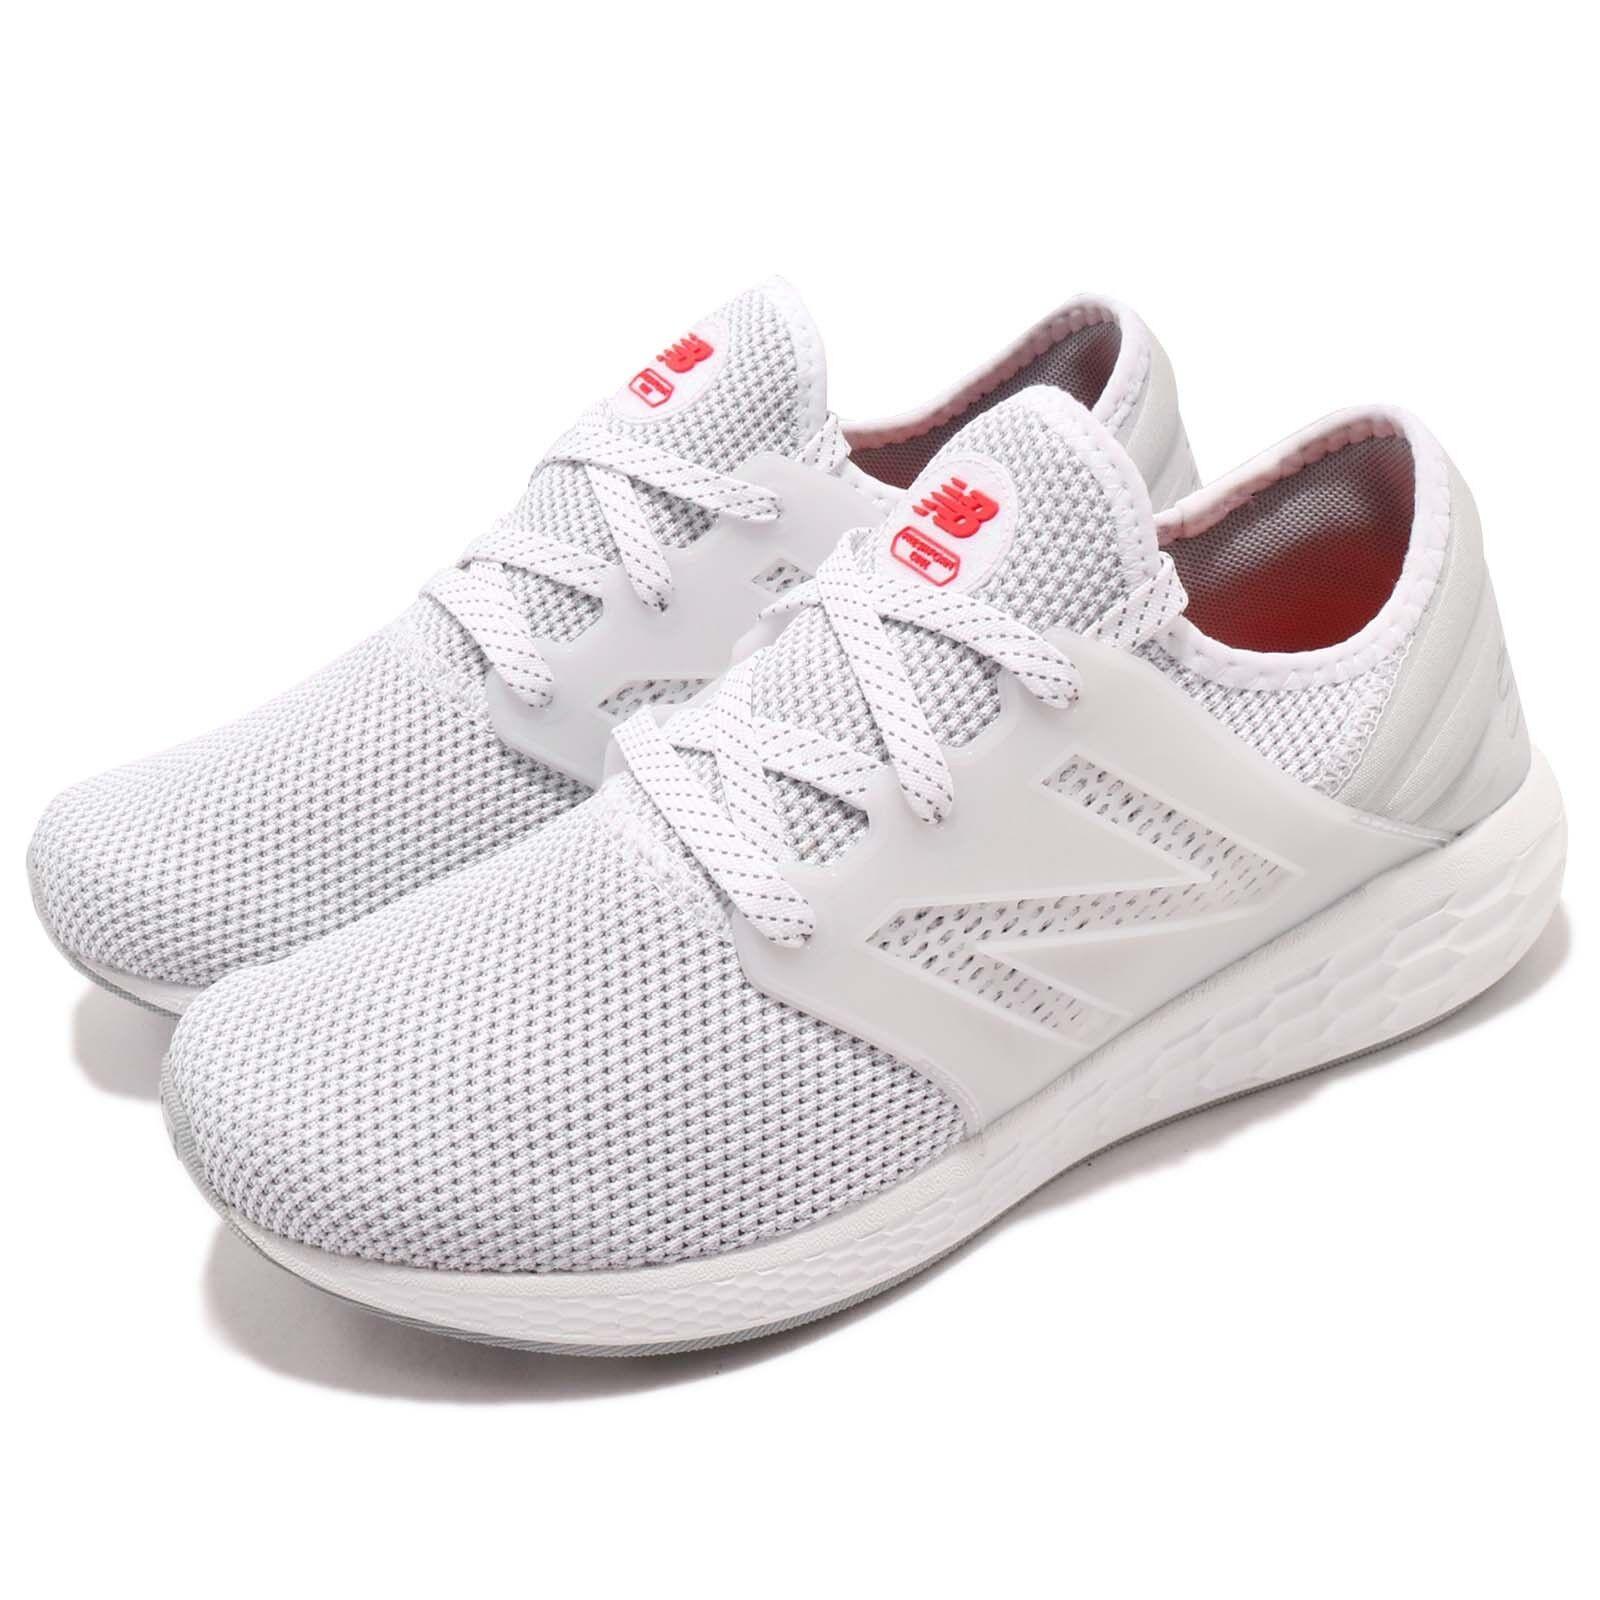 New Balance MCRUZRW2 D White Red Men Running shoes Sneakers Trainers MCRUZRW2D